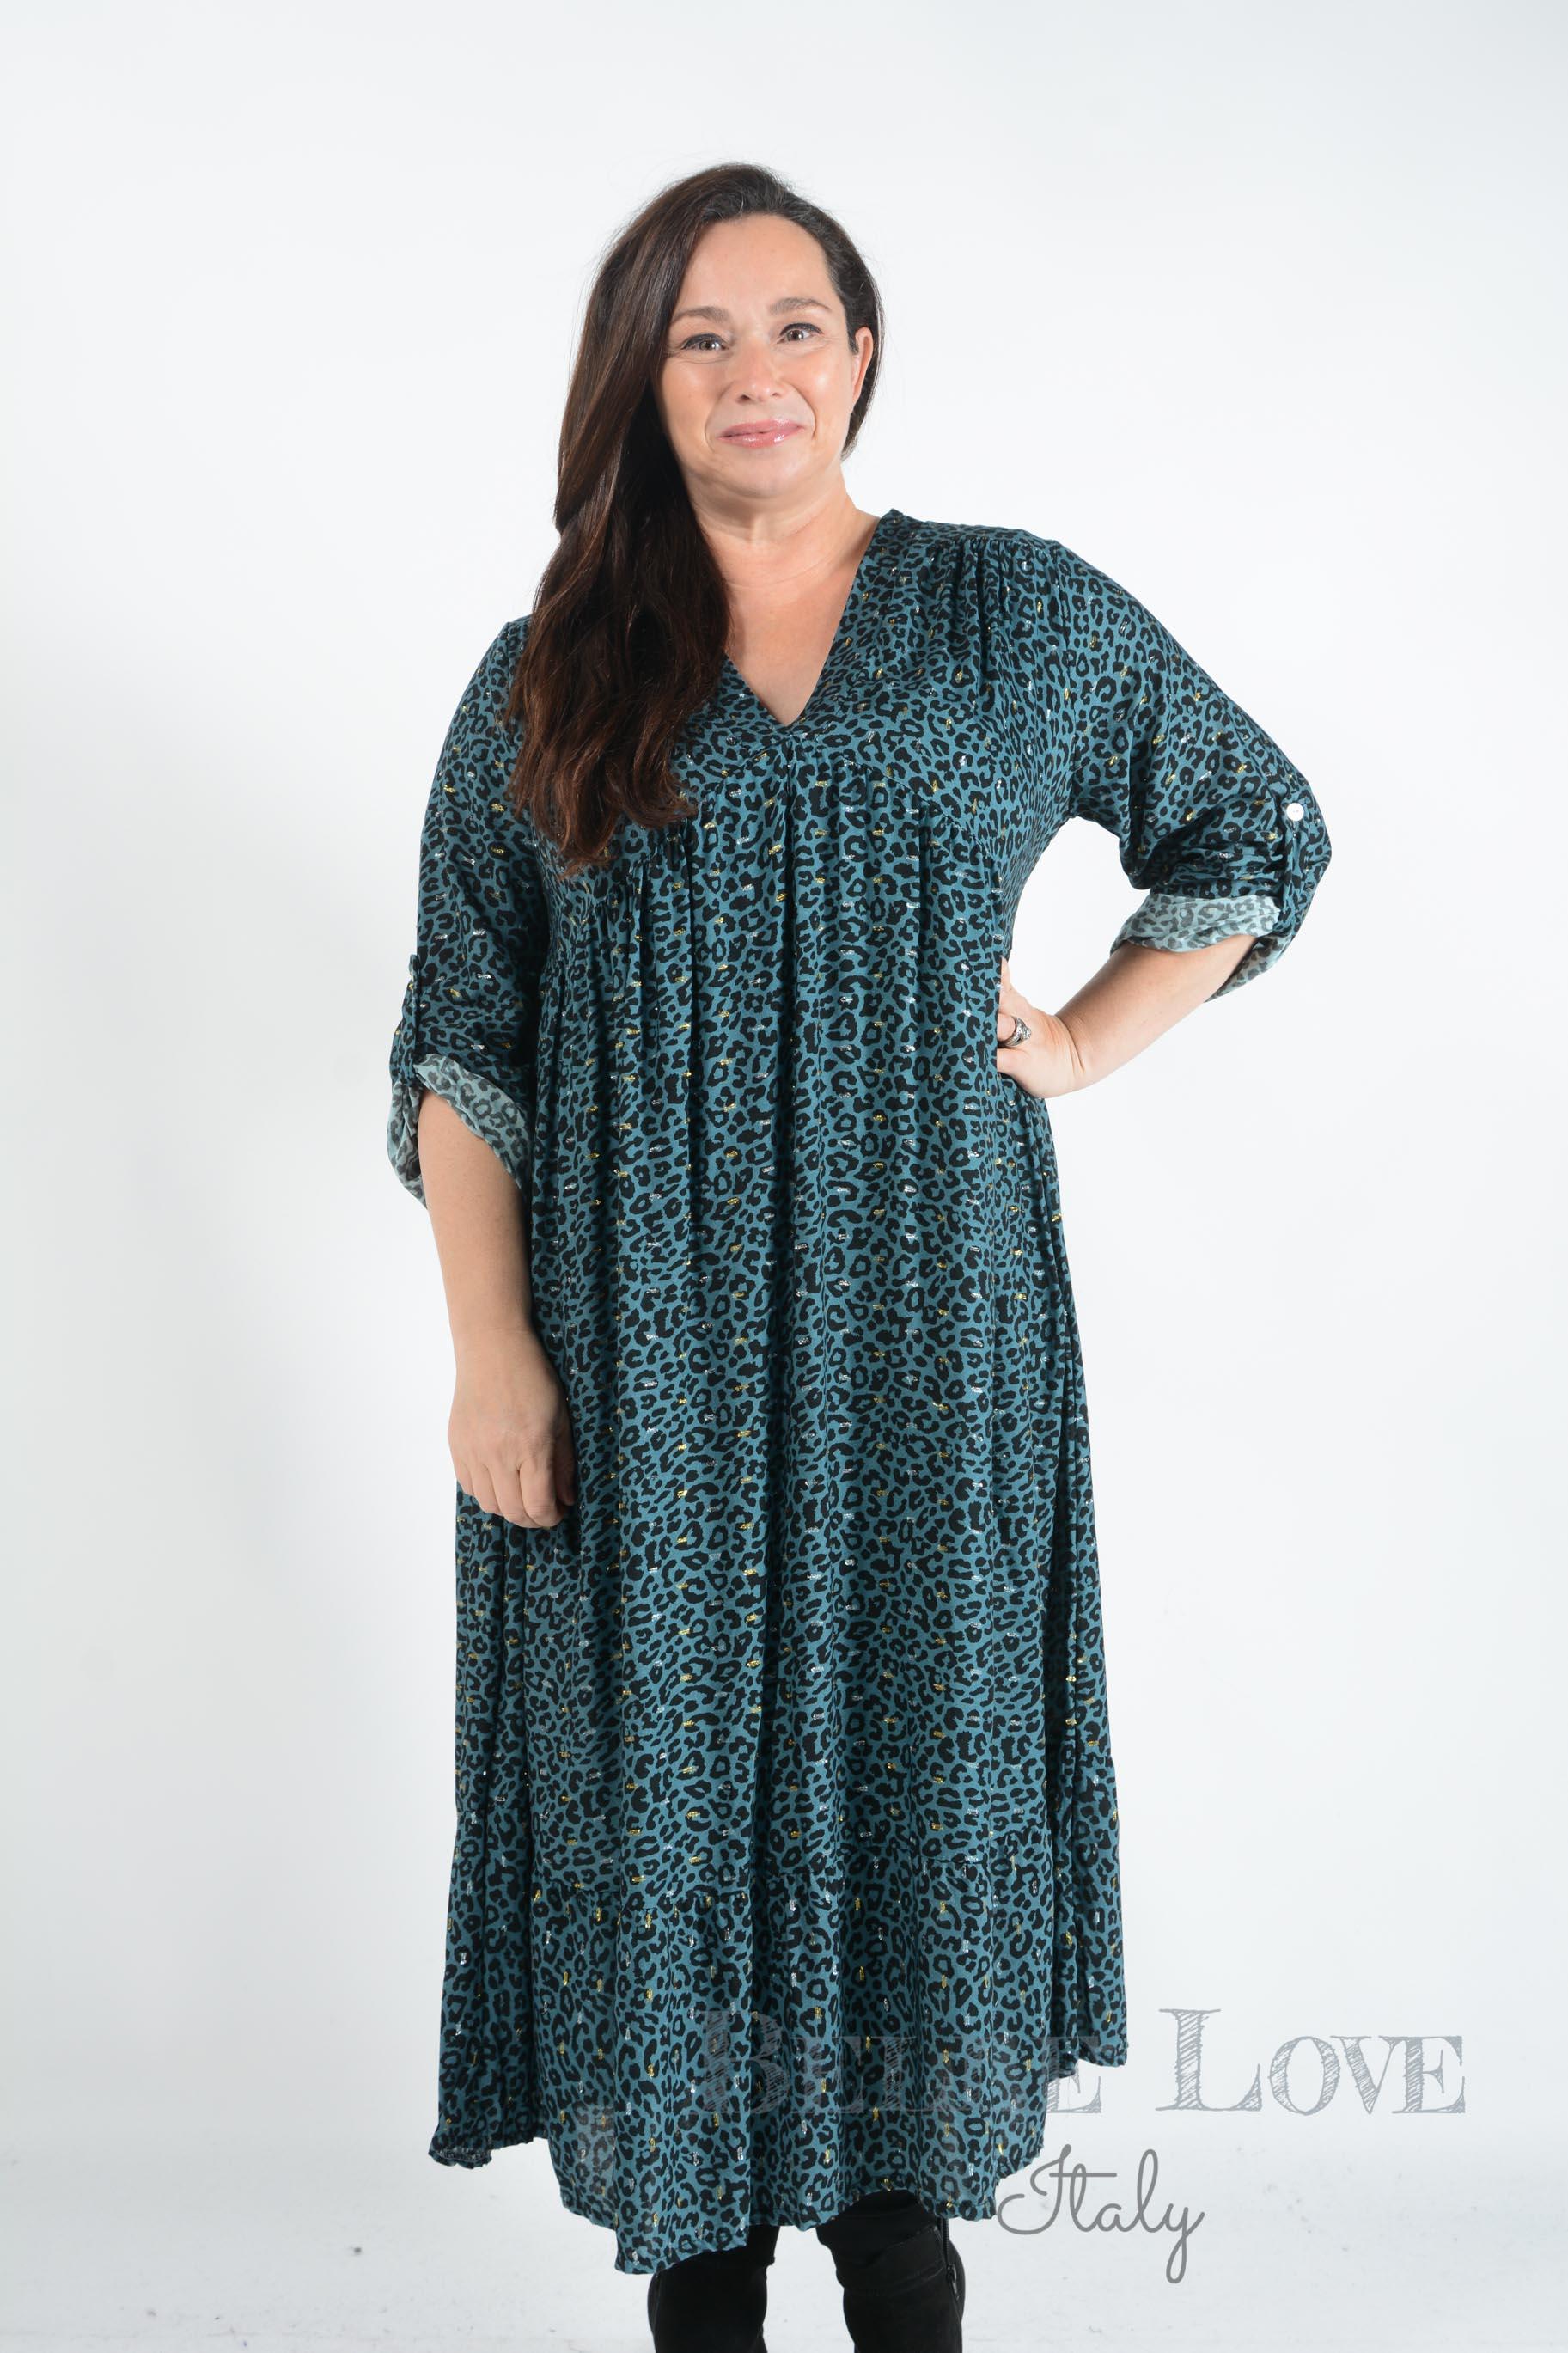 Belle Love Italy Tallie Maxi Dress